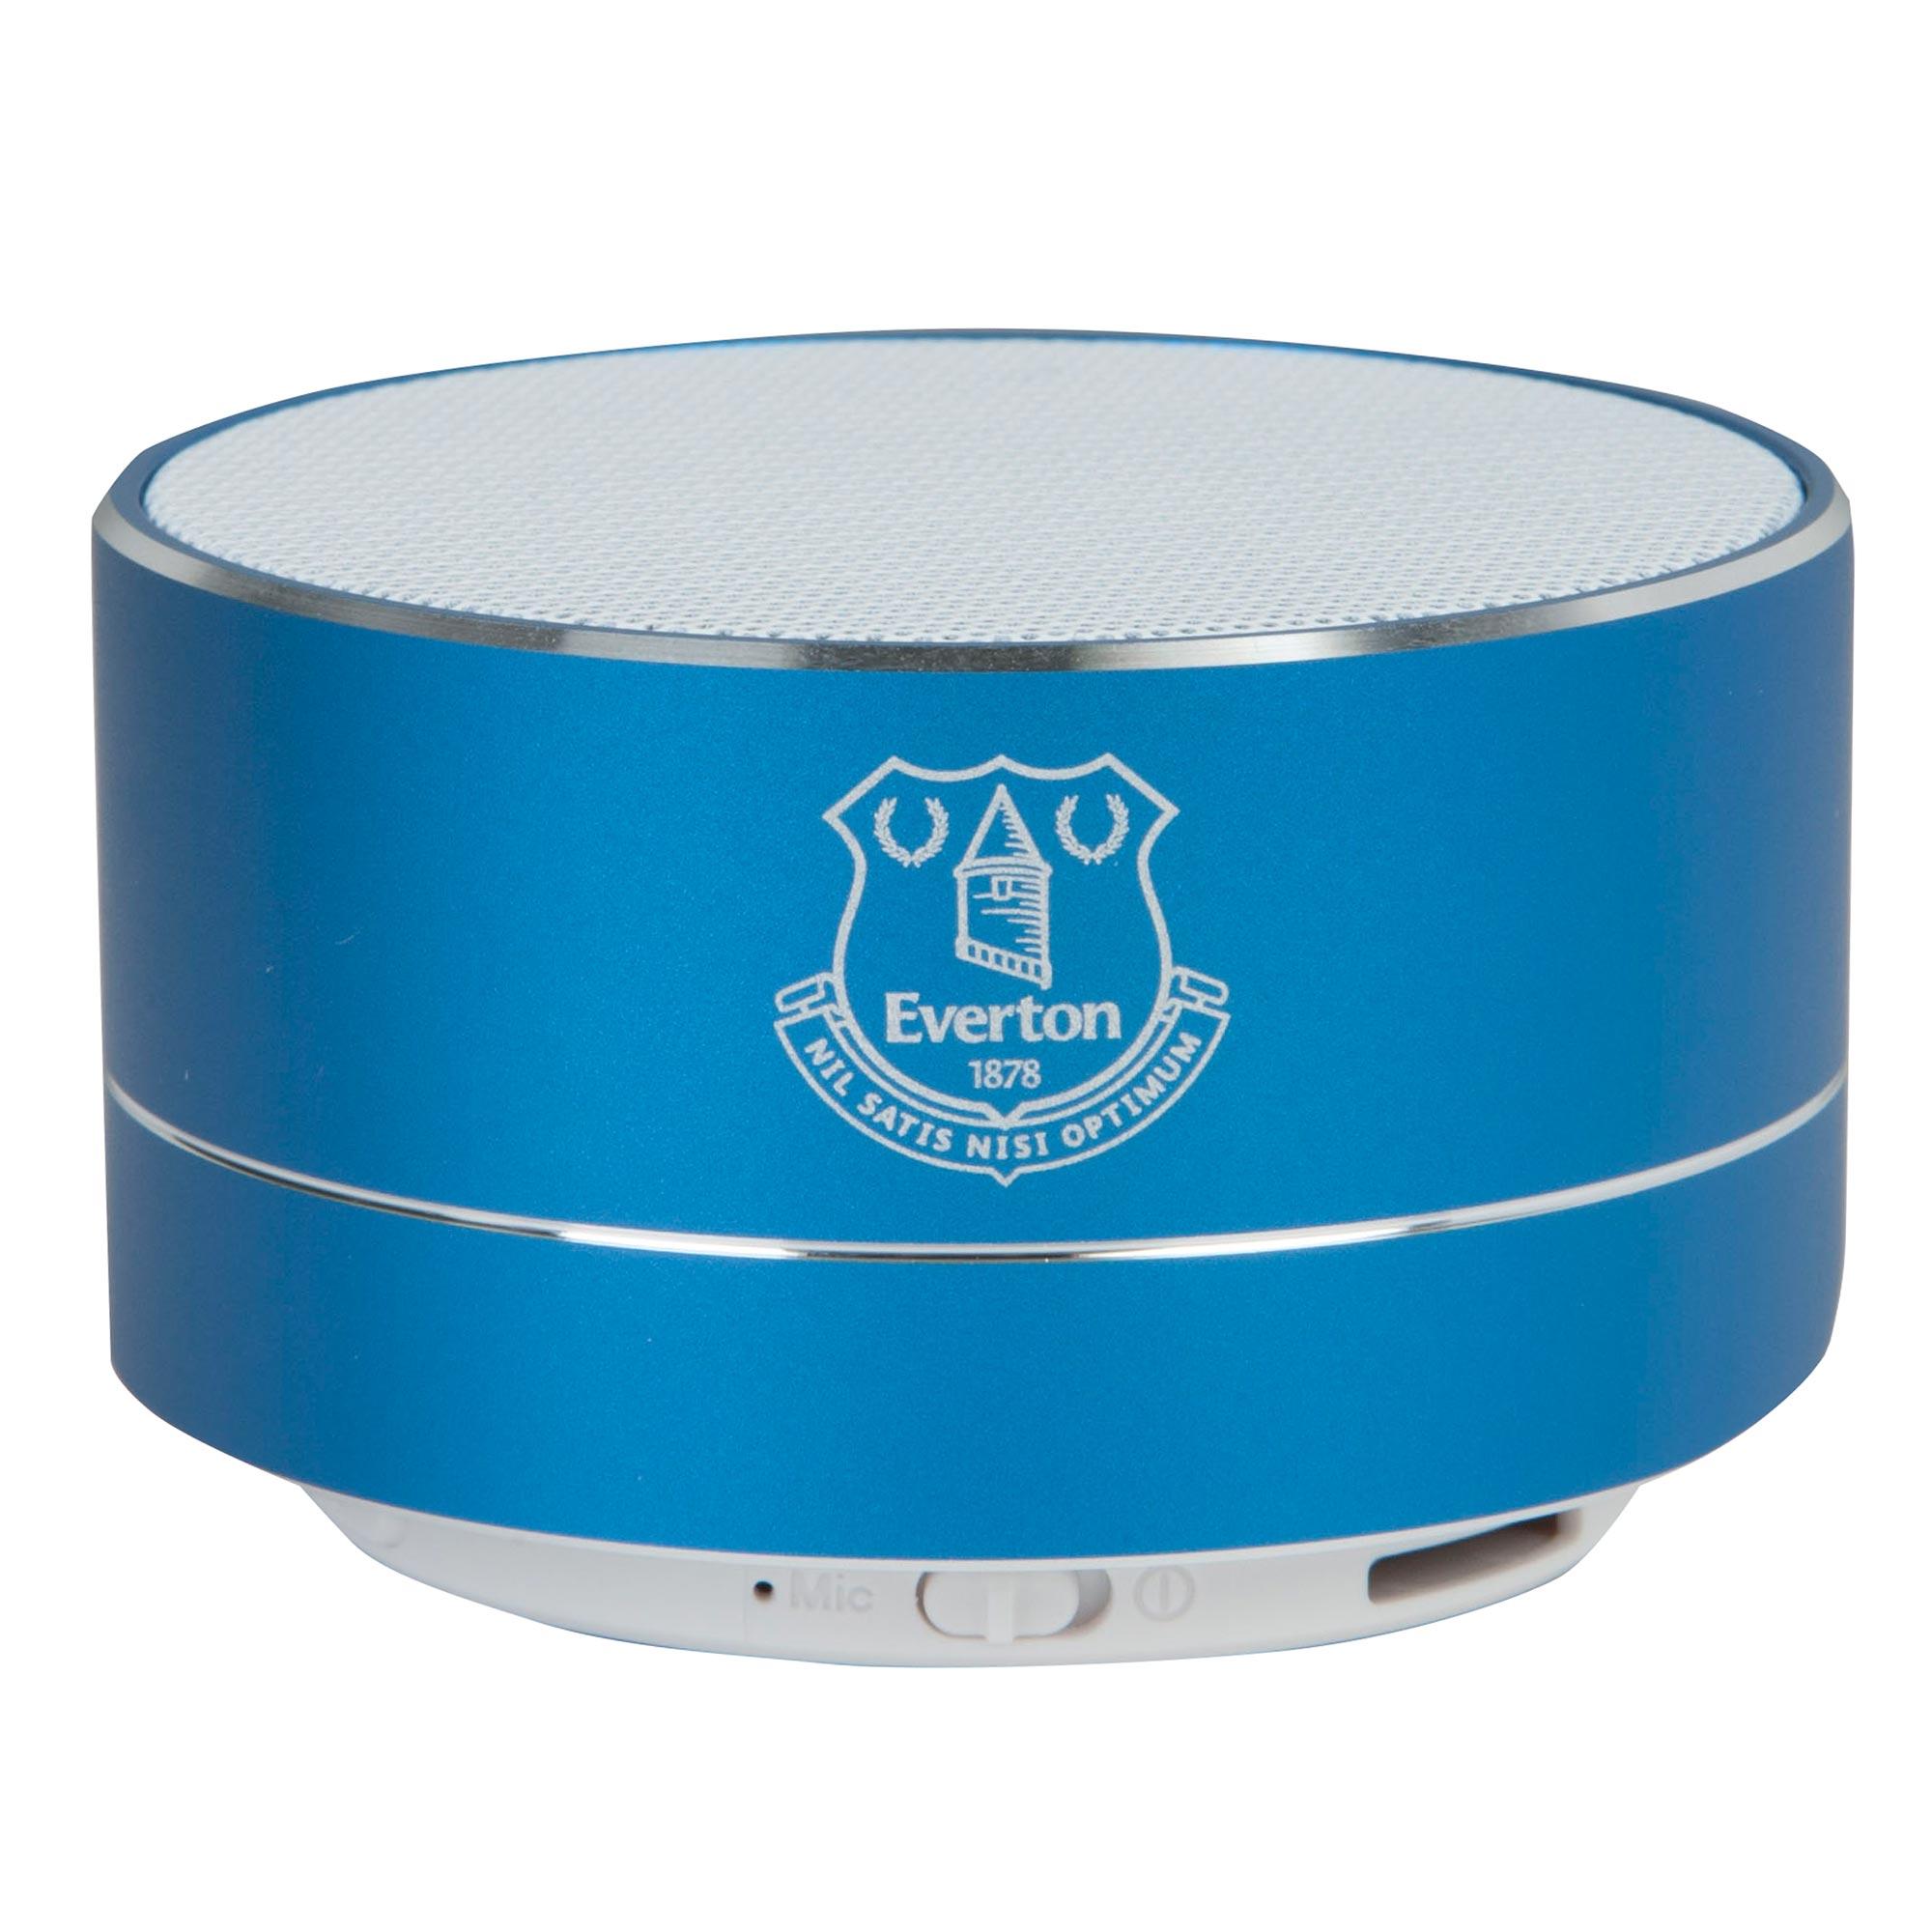 Everton Portable Bluetooth Speaker